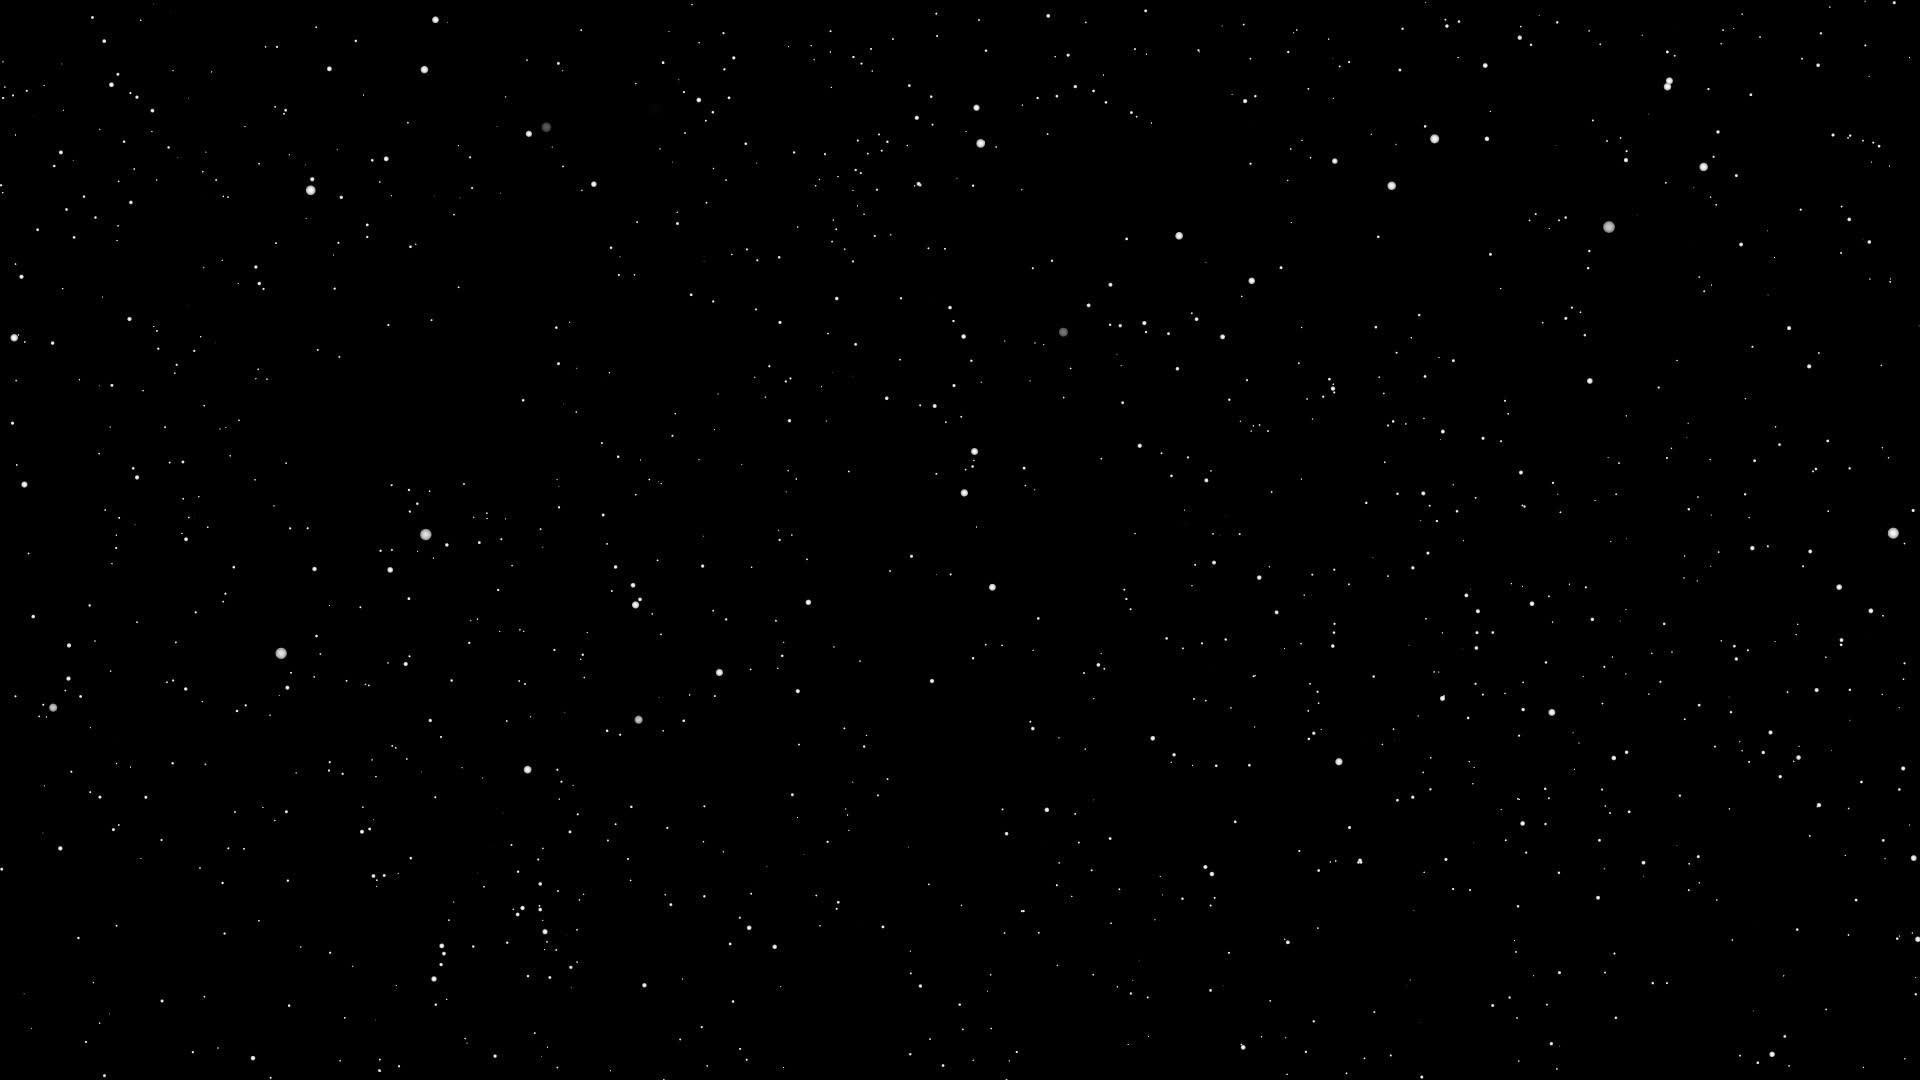 Dark Space Wallpaper: Dark Space Wallpaper (71+ Images